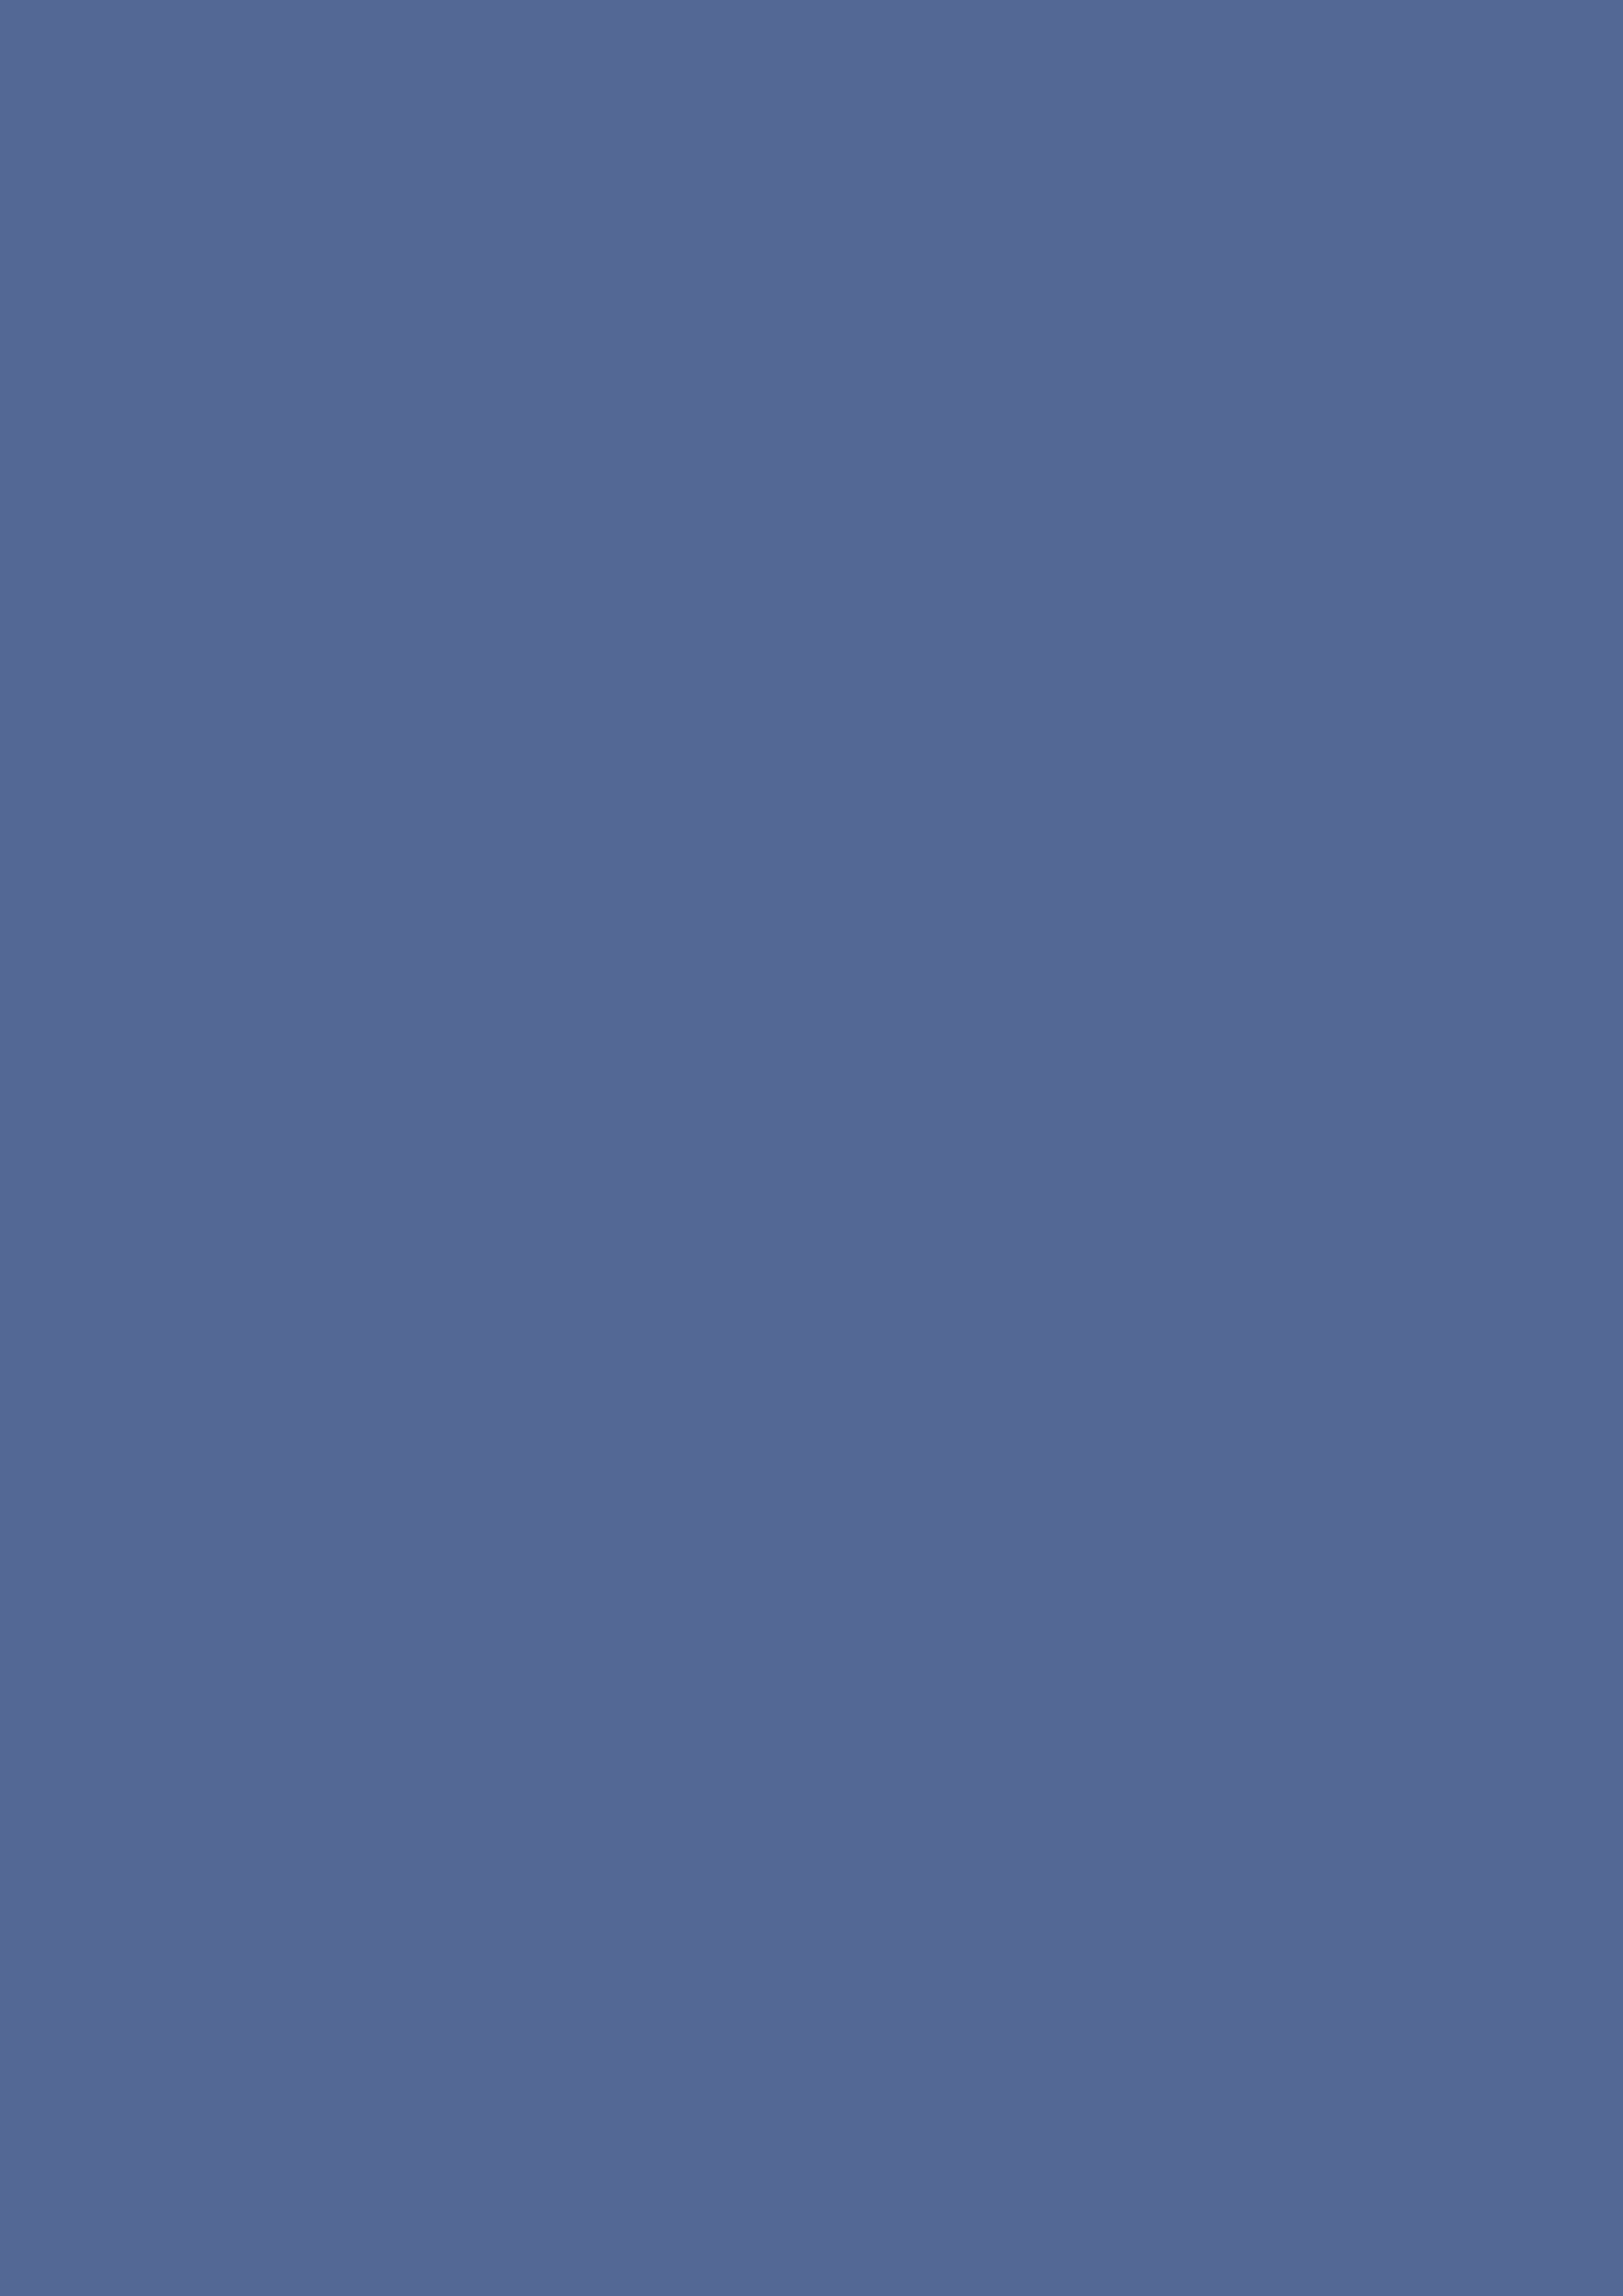 2480x3508 UCLA Blue Solid Color Background